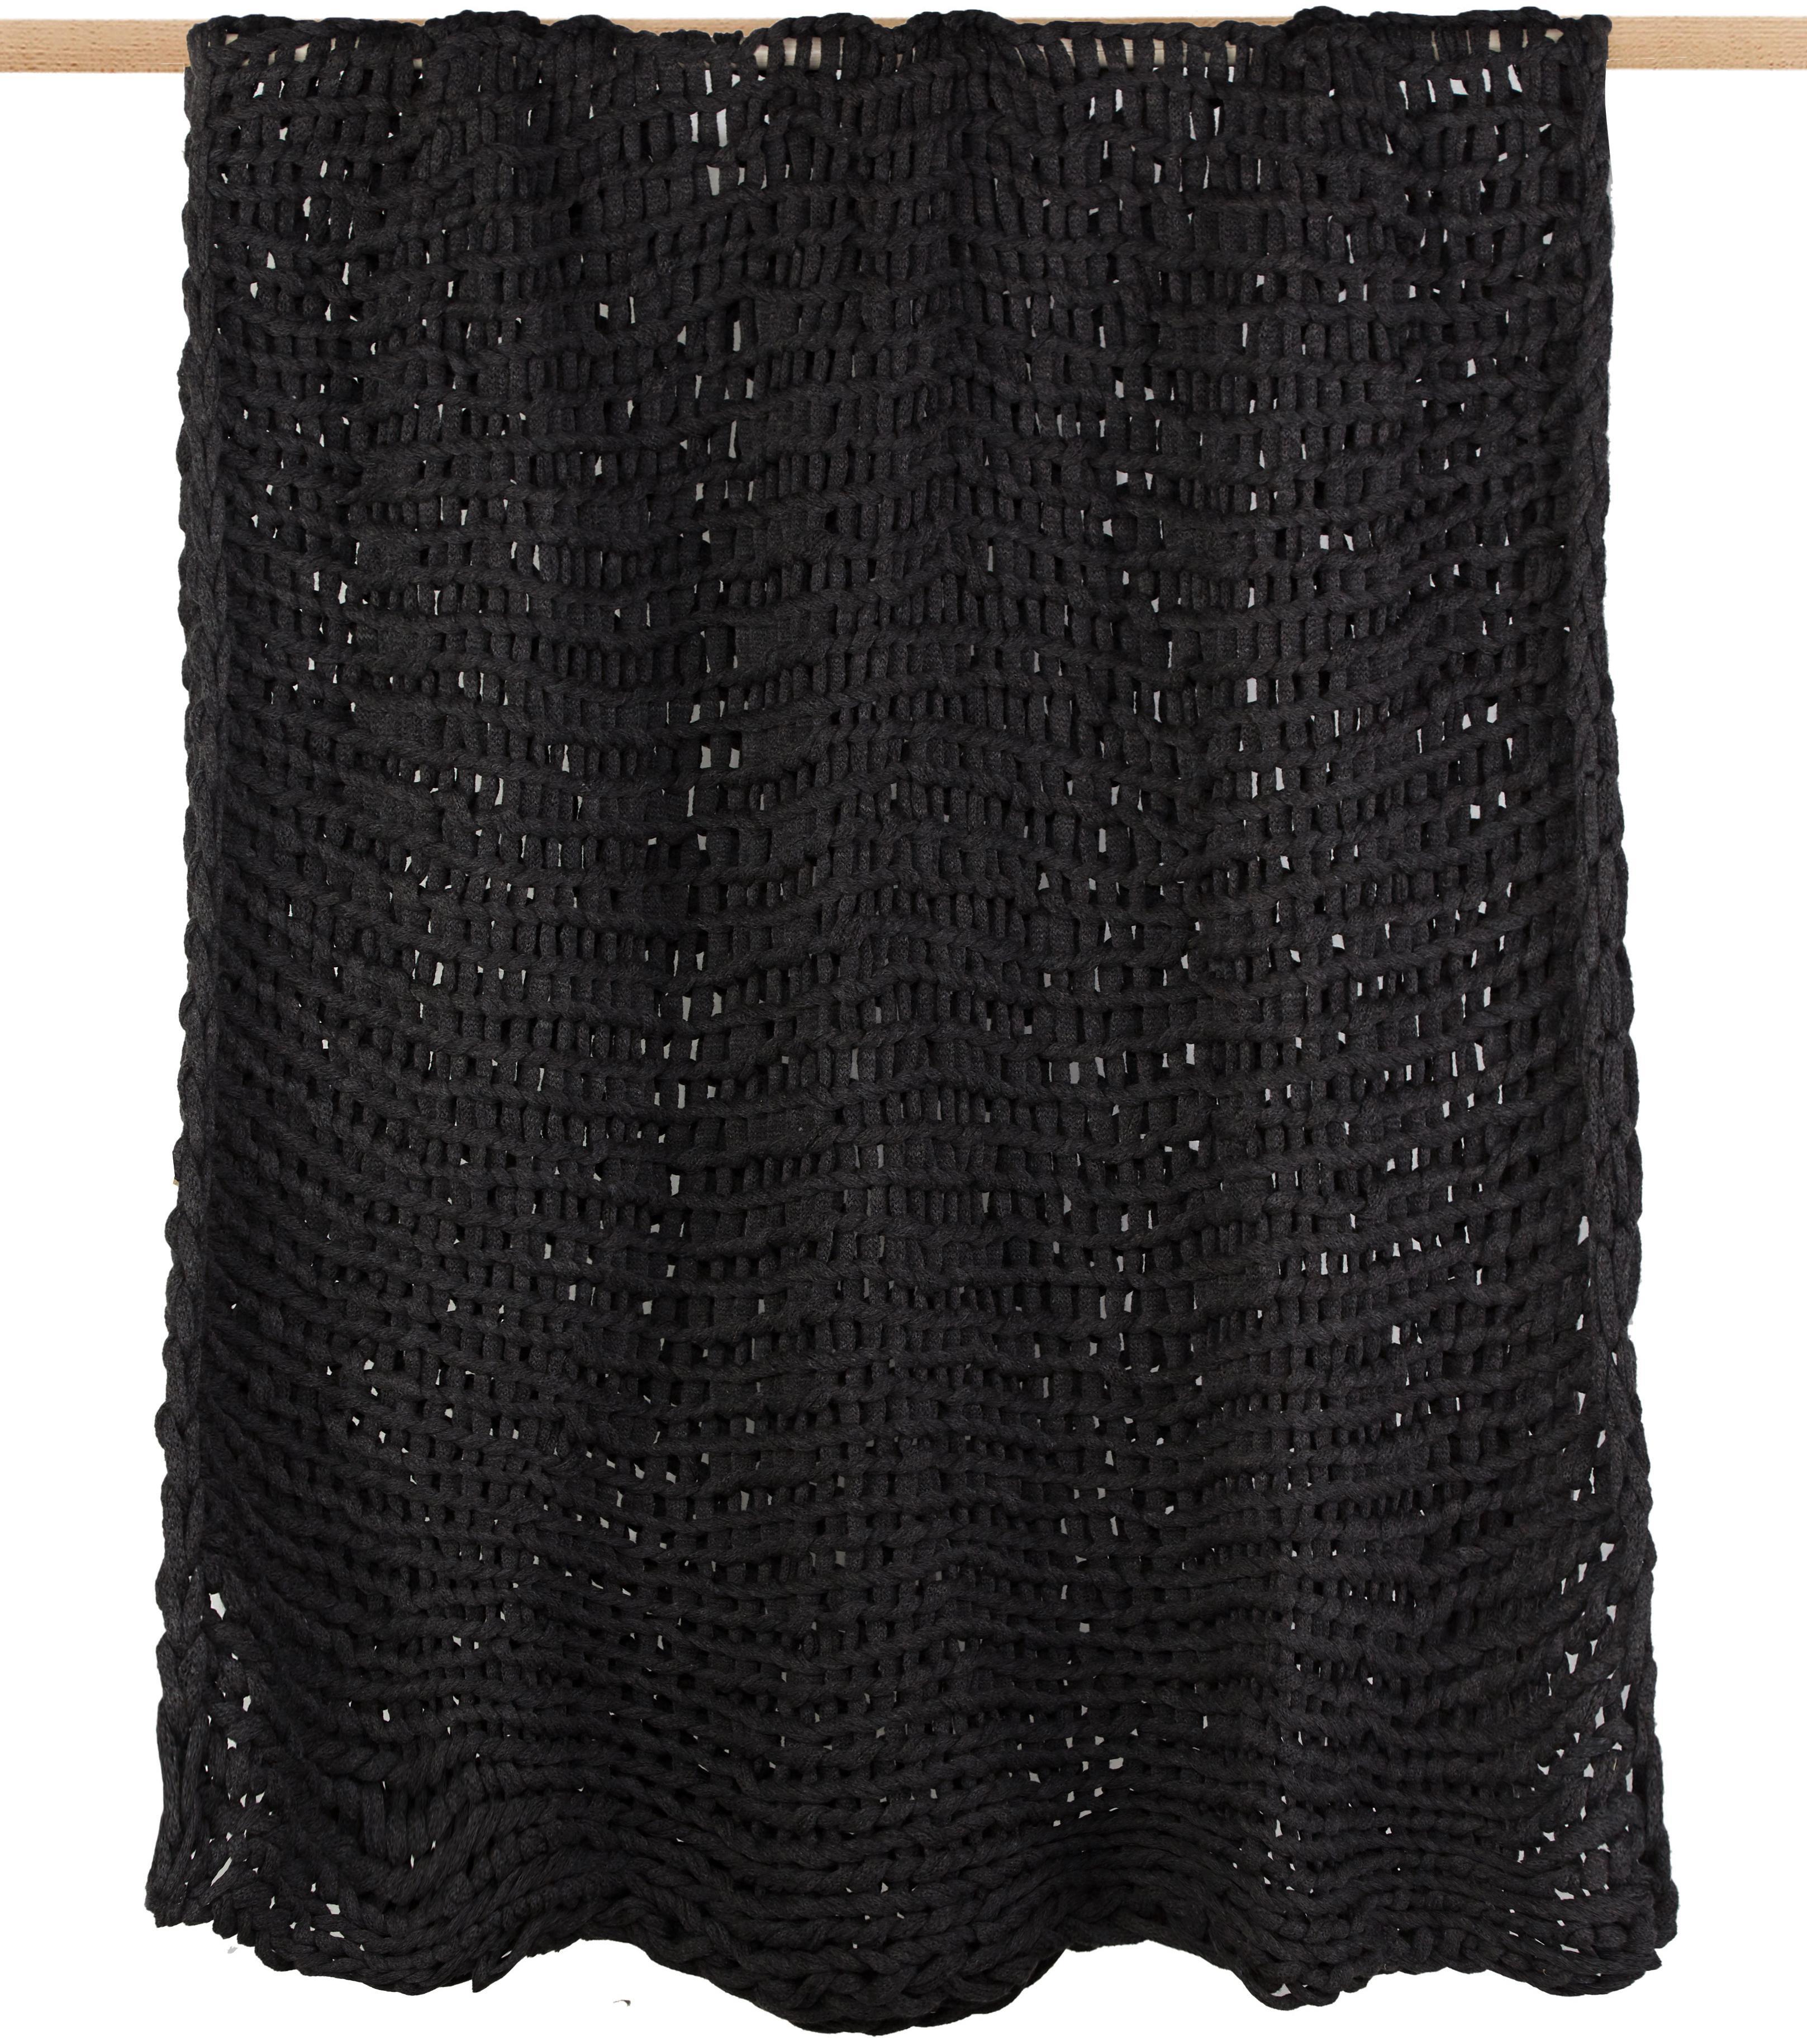 Manta de punto grueso Adyna, 100%acrílico, Gris oscuro, 150 x 200 cm